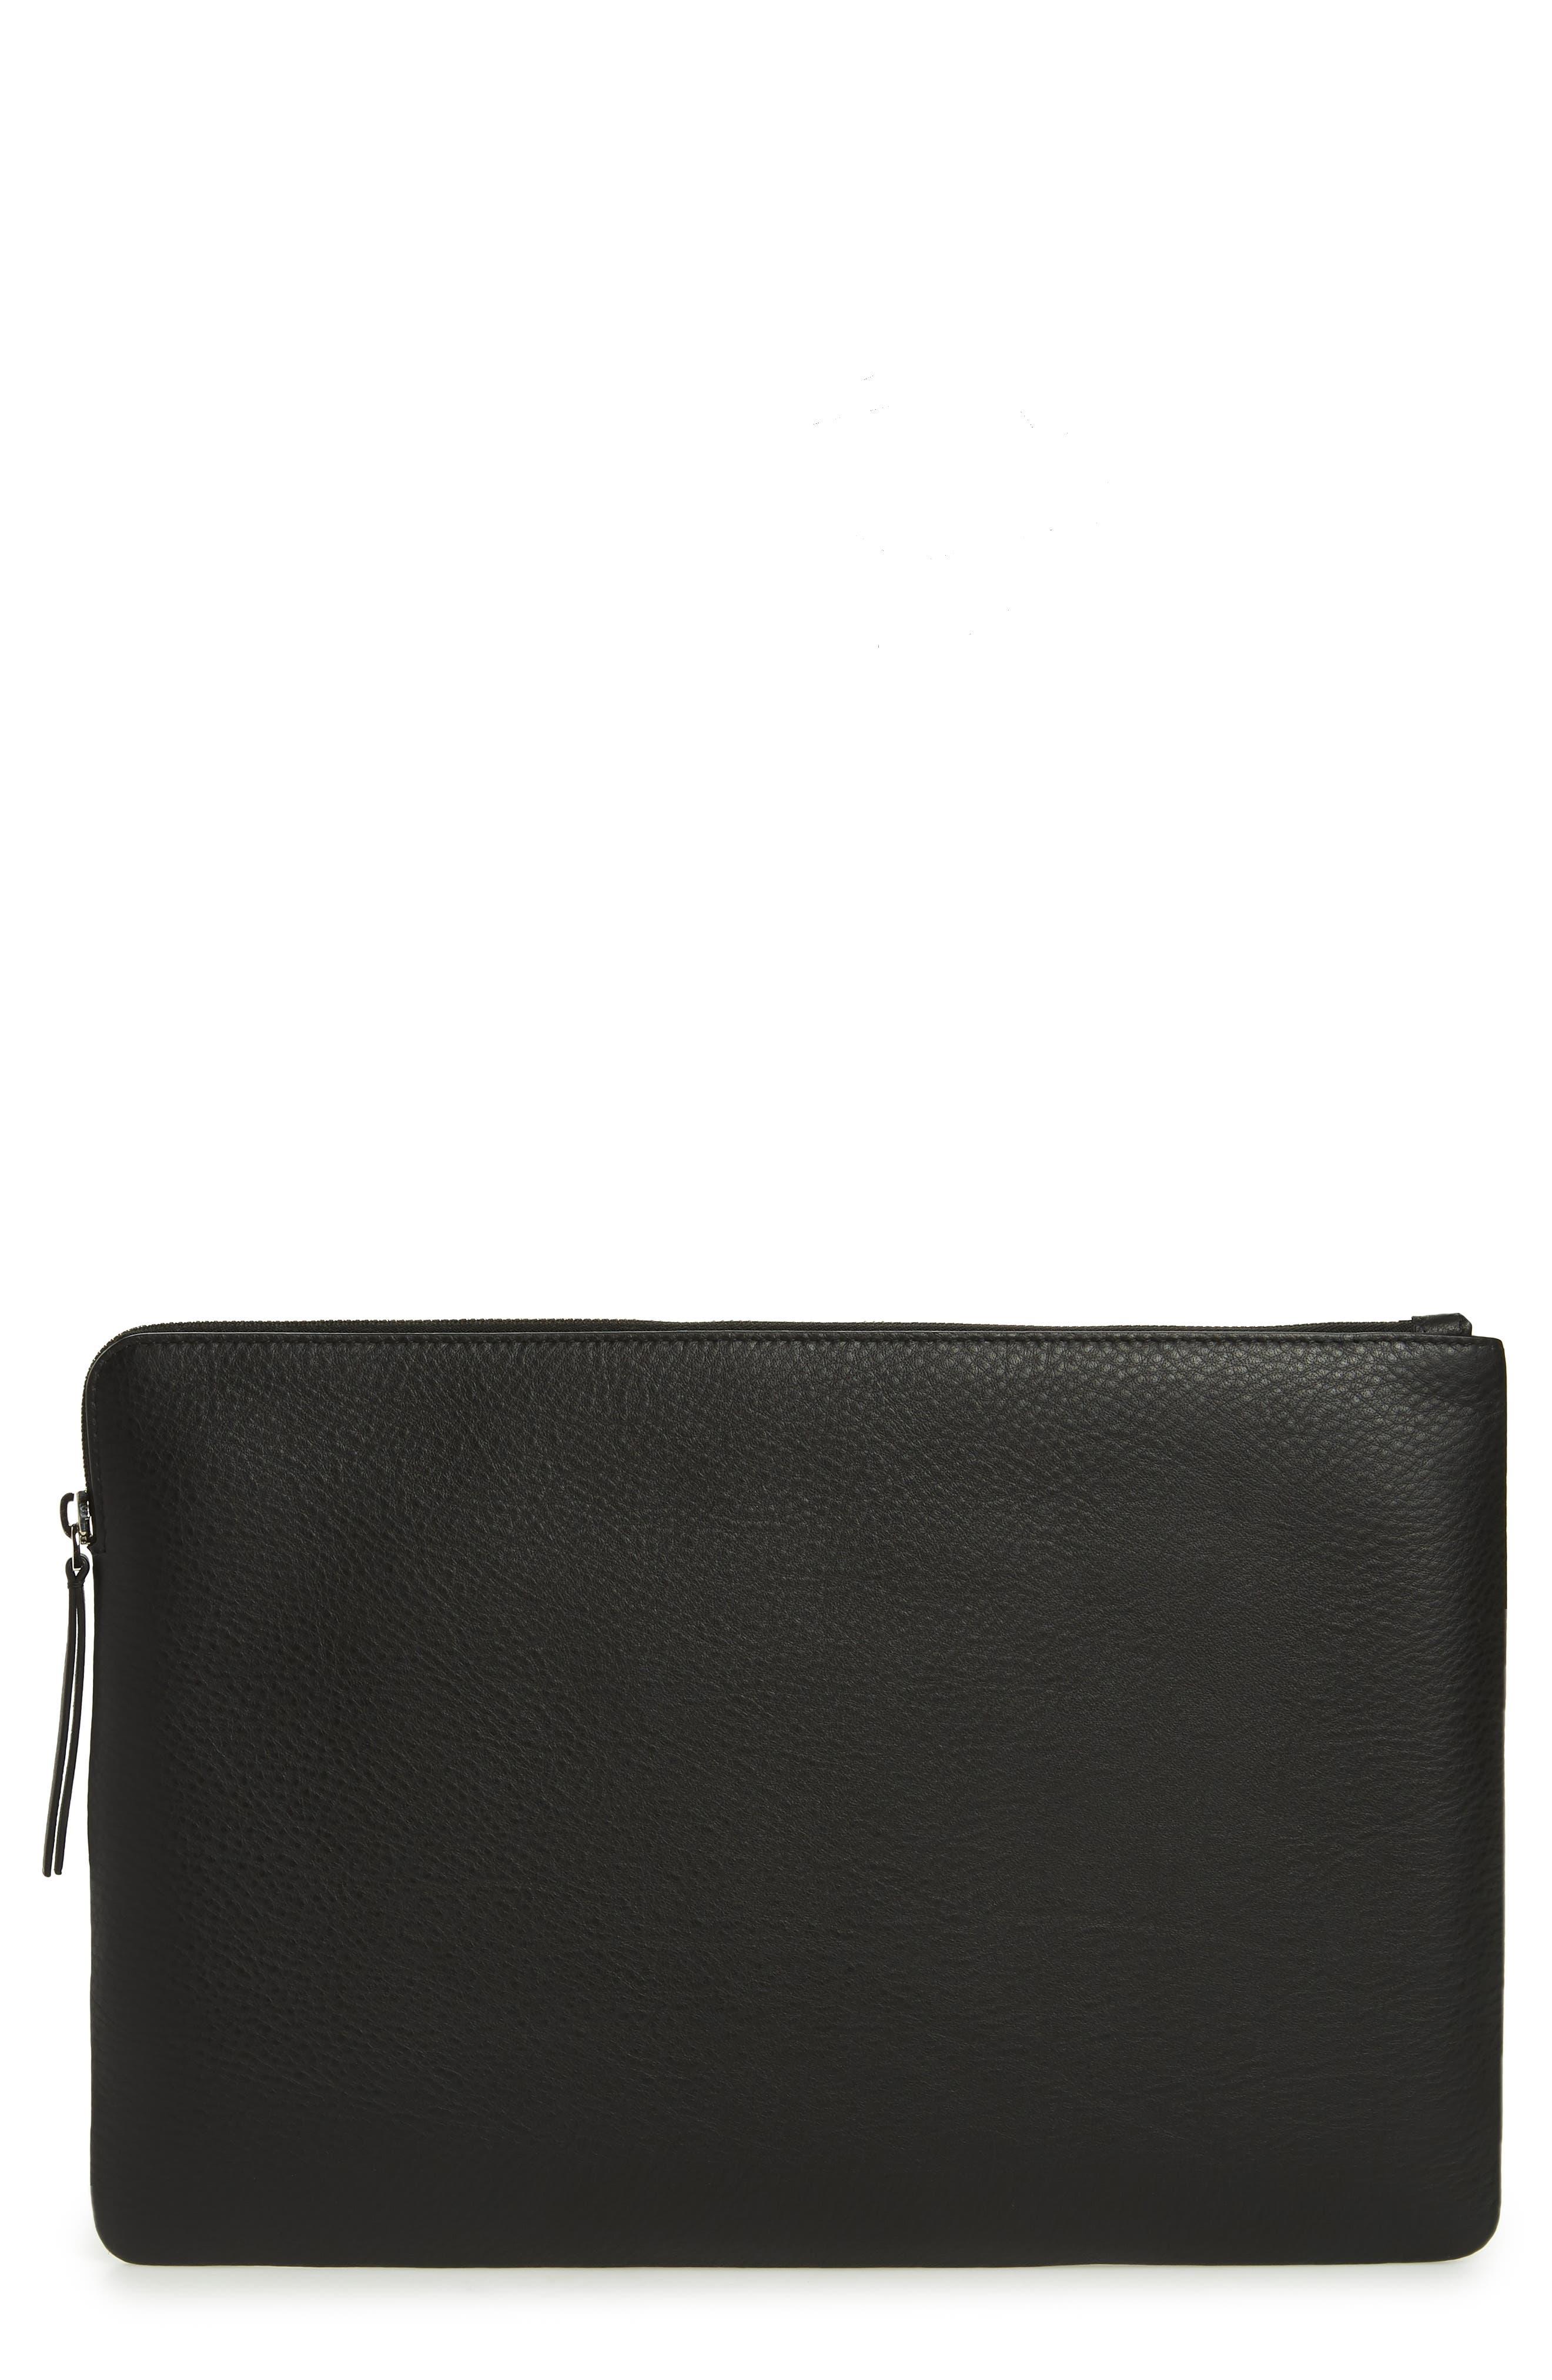 Balencia Large Everyday Leather Pouch,                             Main thumbnail 1, color,                             NOIR/ BLANC